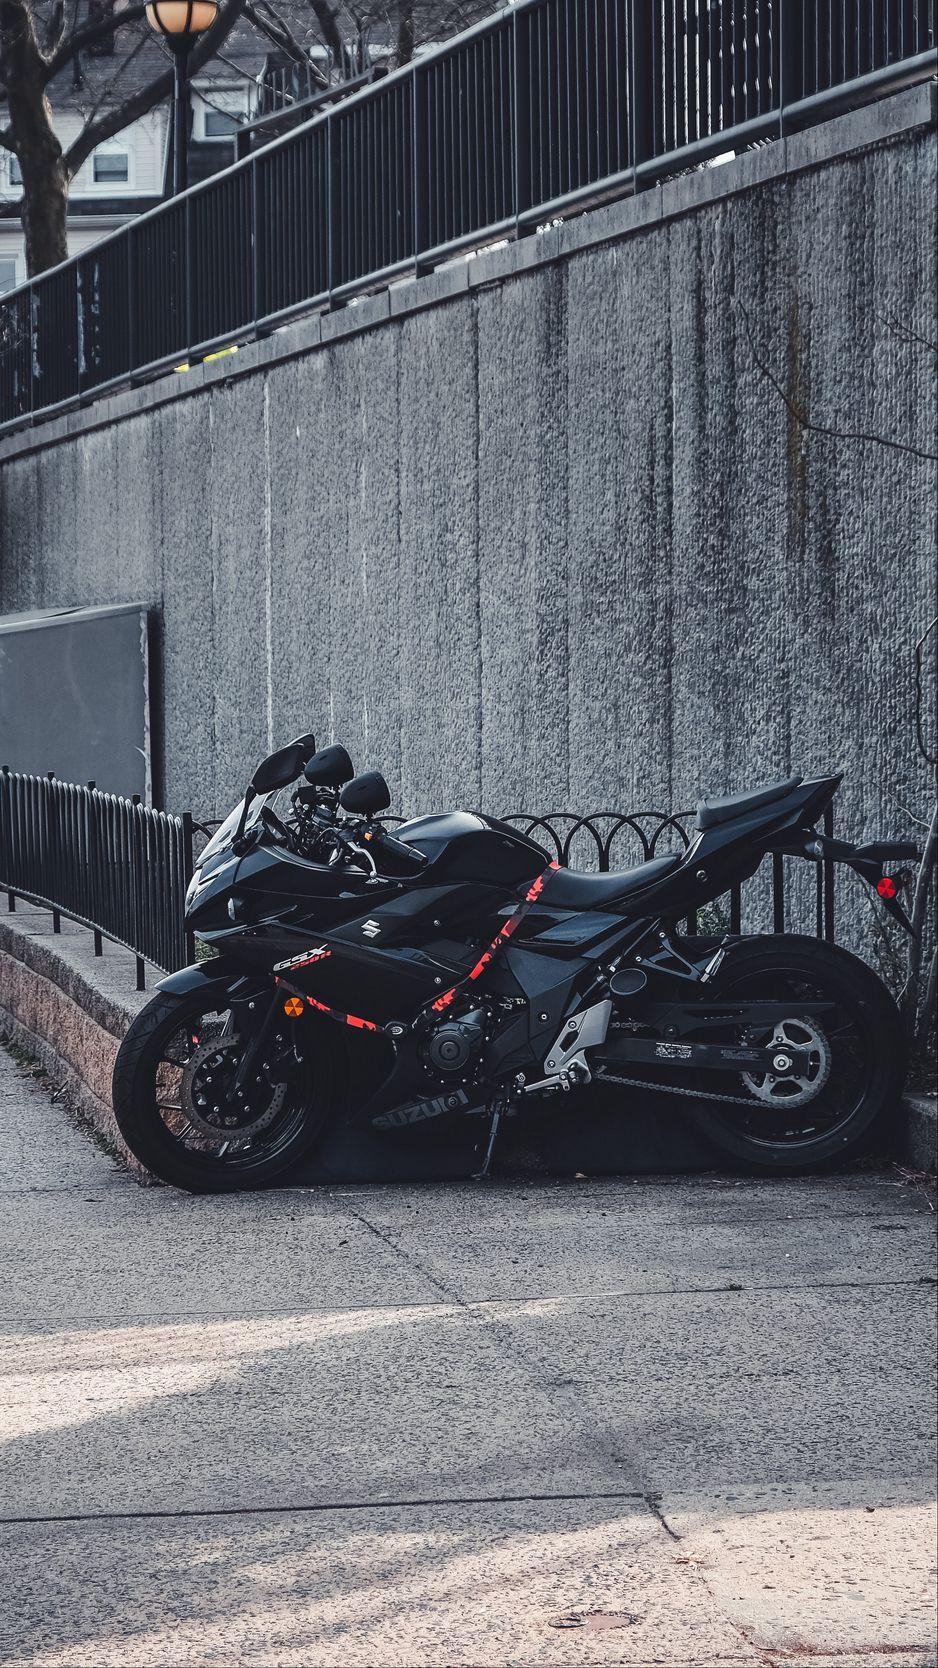 938x1668 Wallpaper suzuki, motorcycle, bike, black, parking